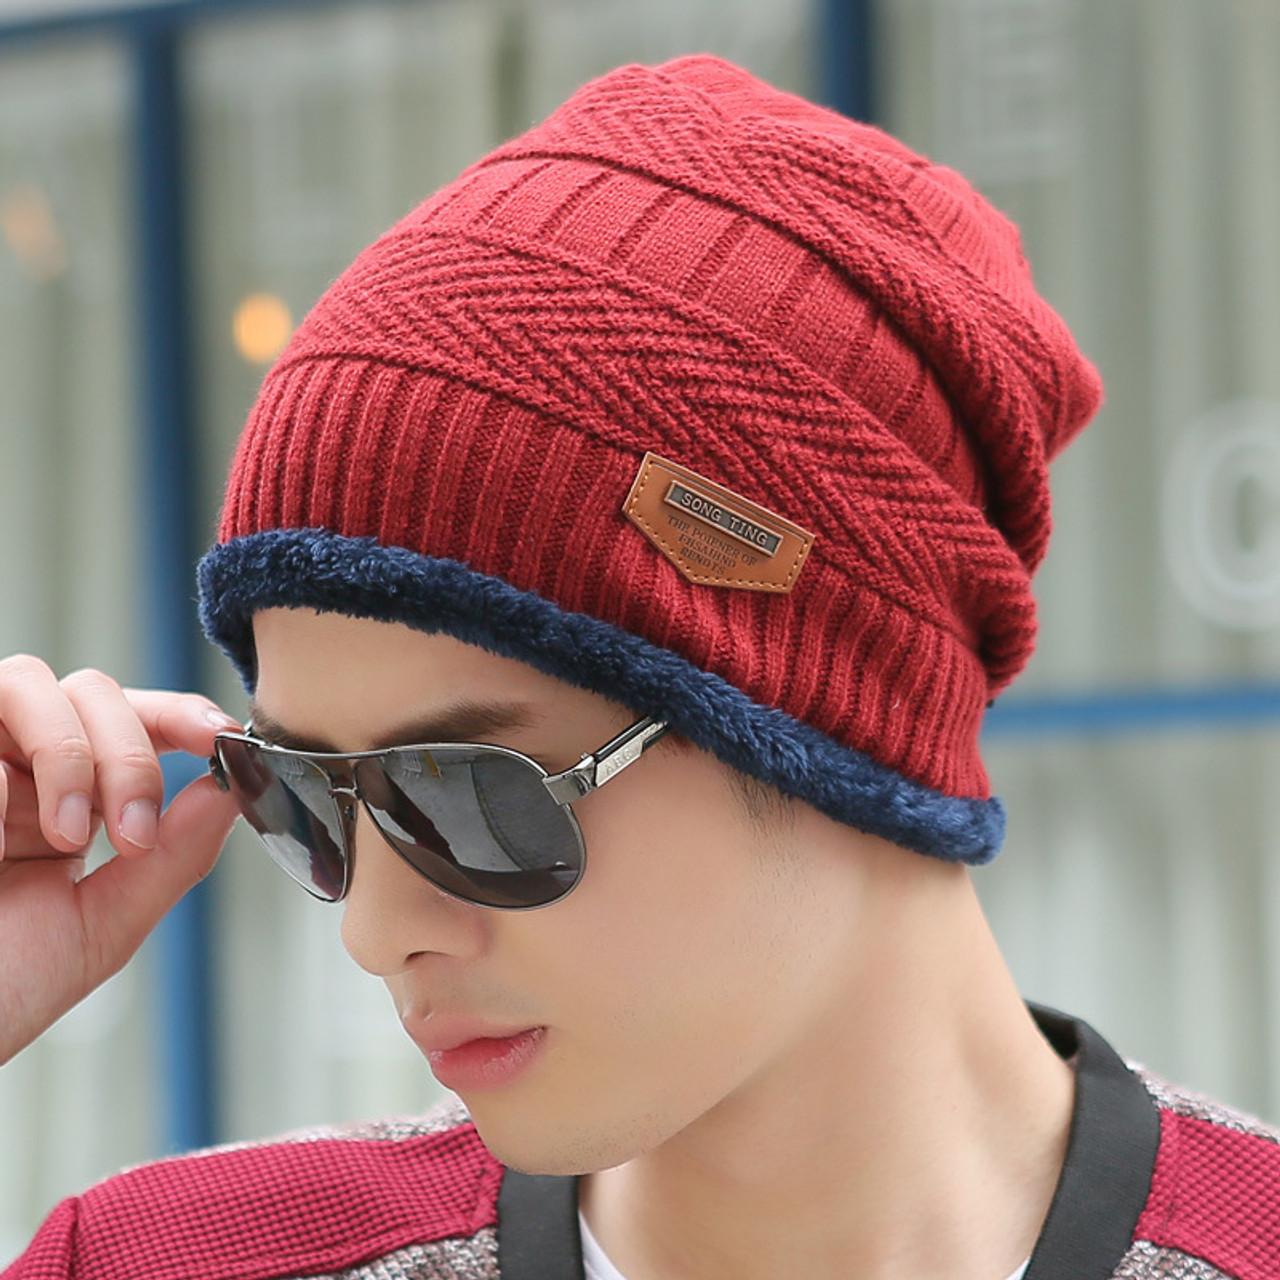 ... Boys Men Winter Hat Knit Scarf Cap Winter Hats for Men Caps Warm Fur  Skullies Beanie ... 5e27aca21bae